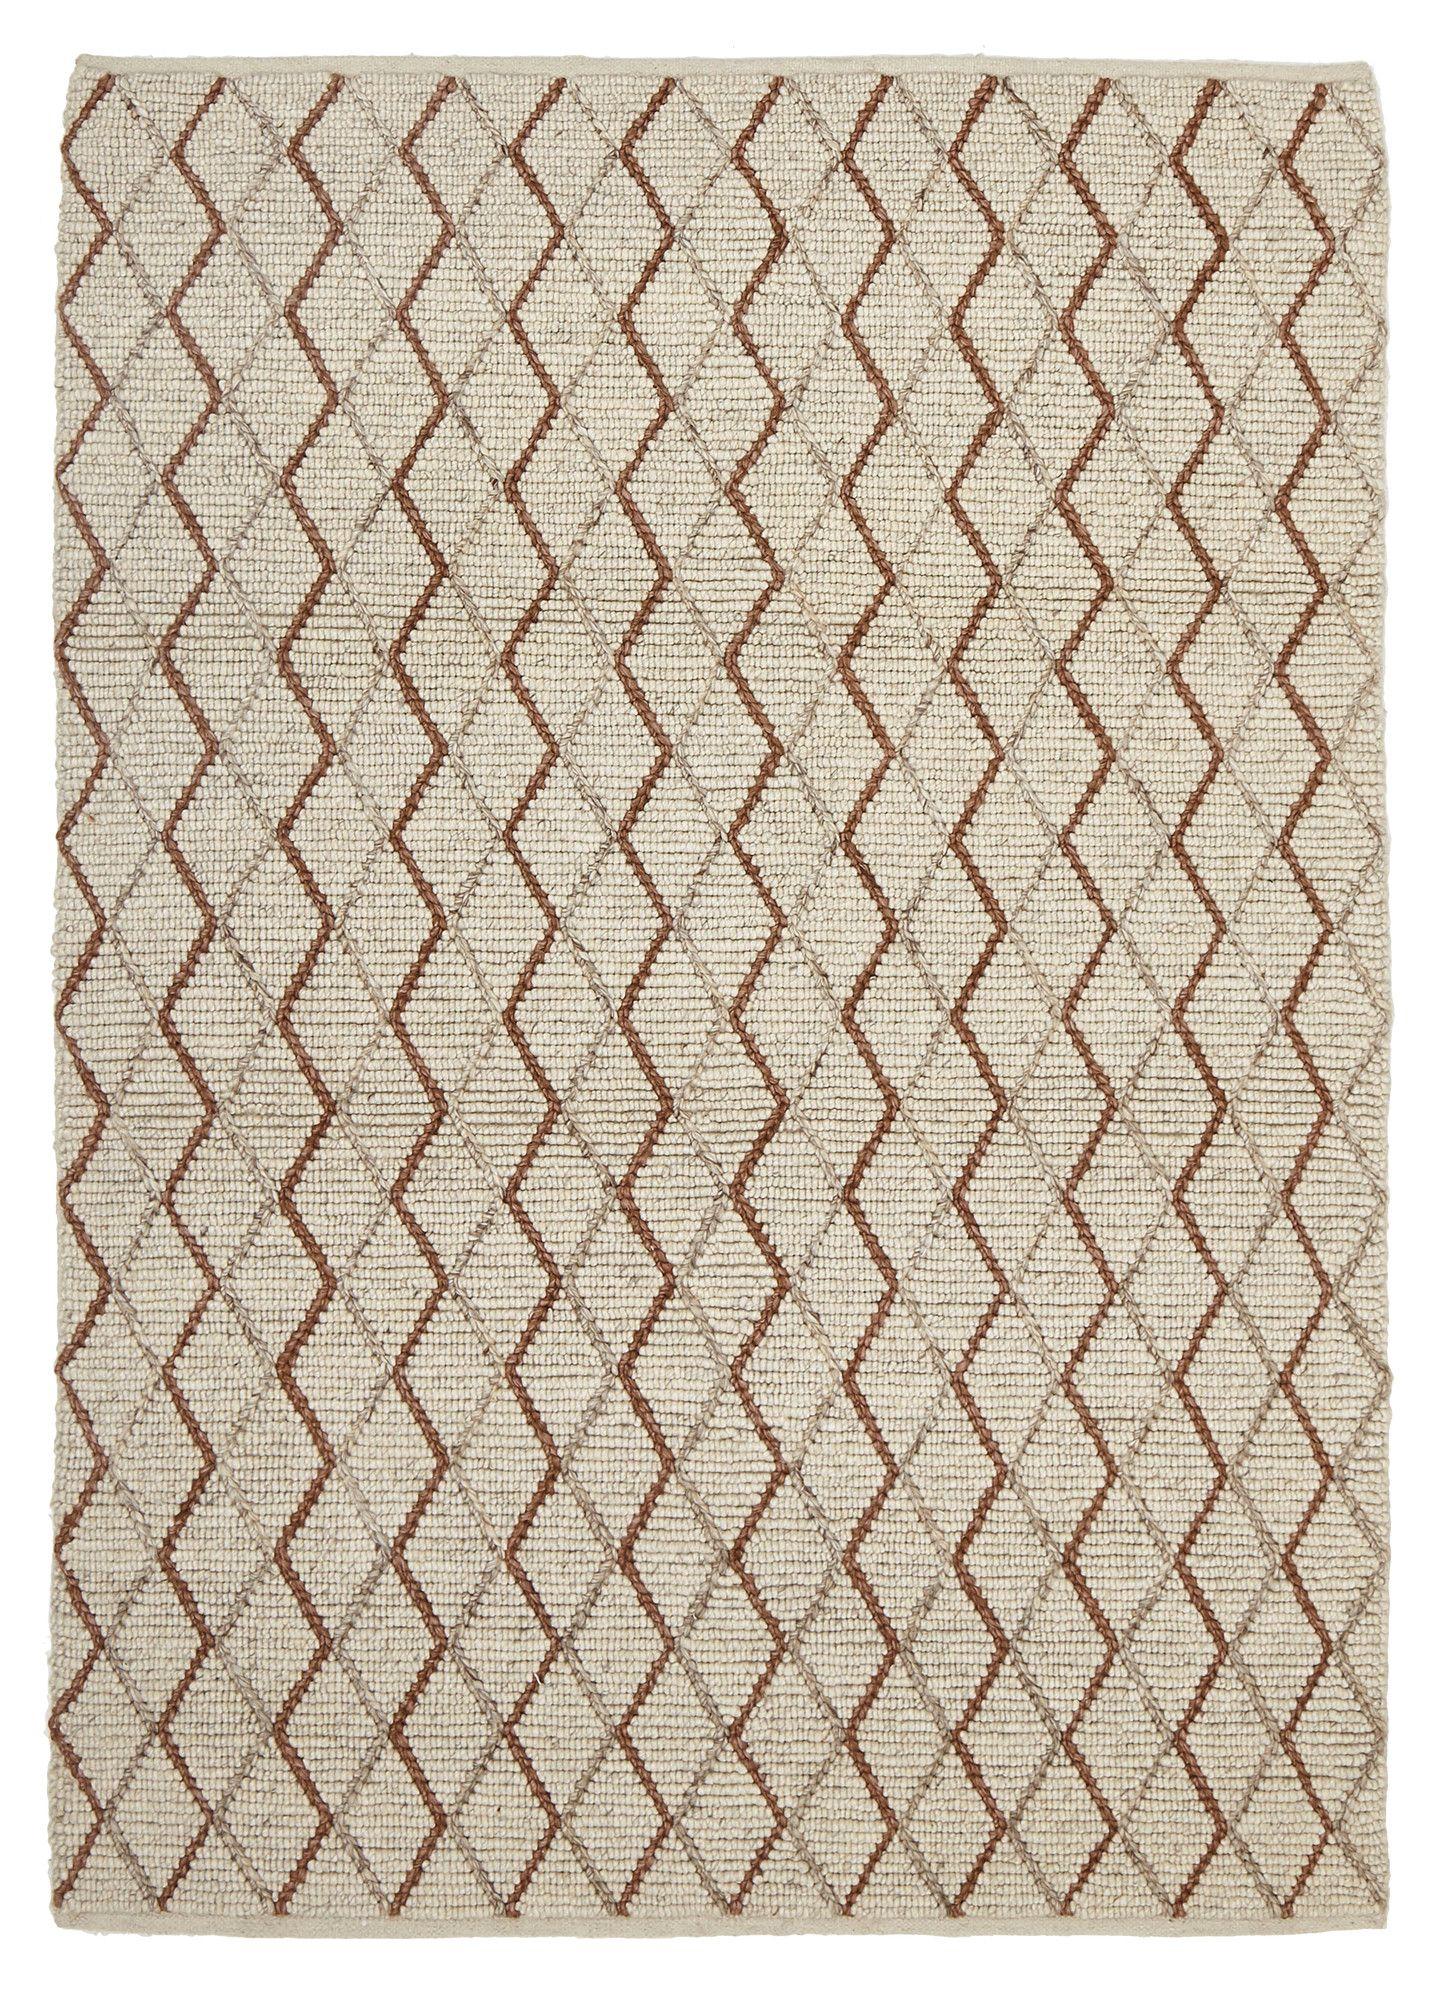 Network Finn Scandinavian Style Viscose and Wool Copper